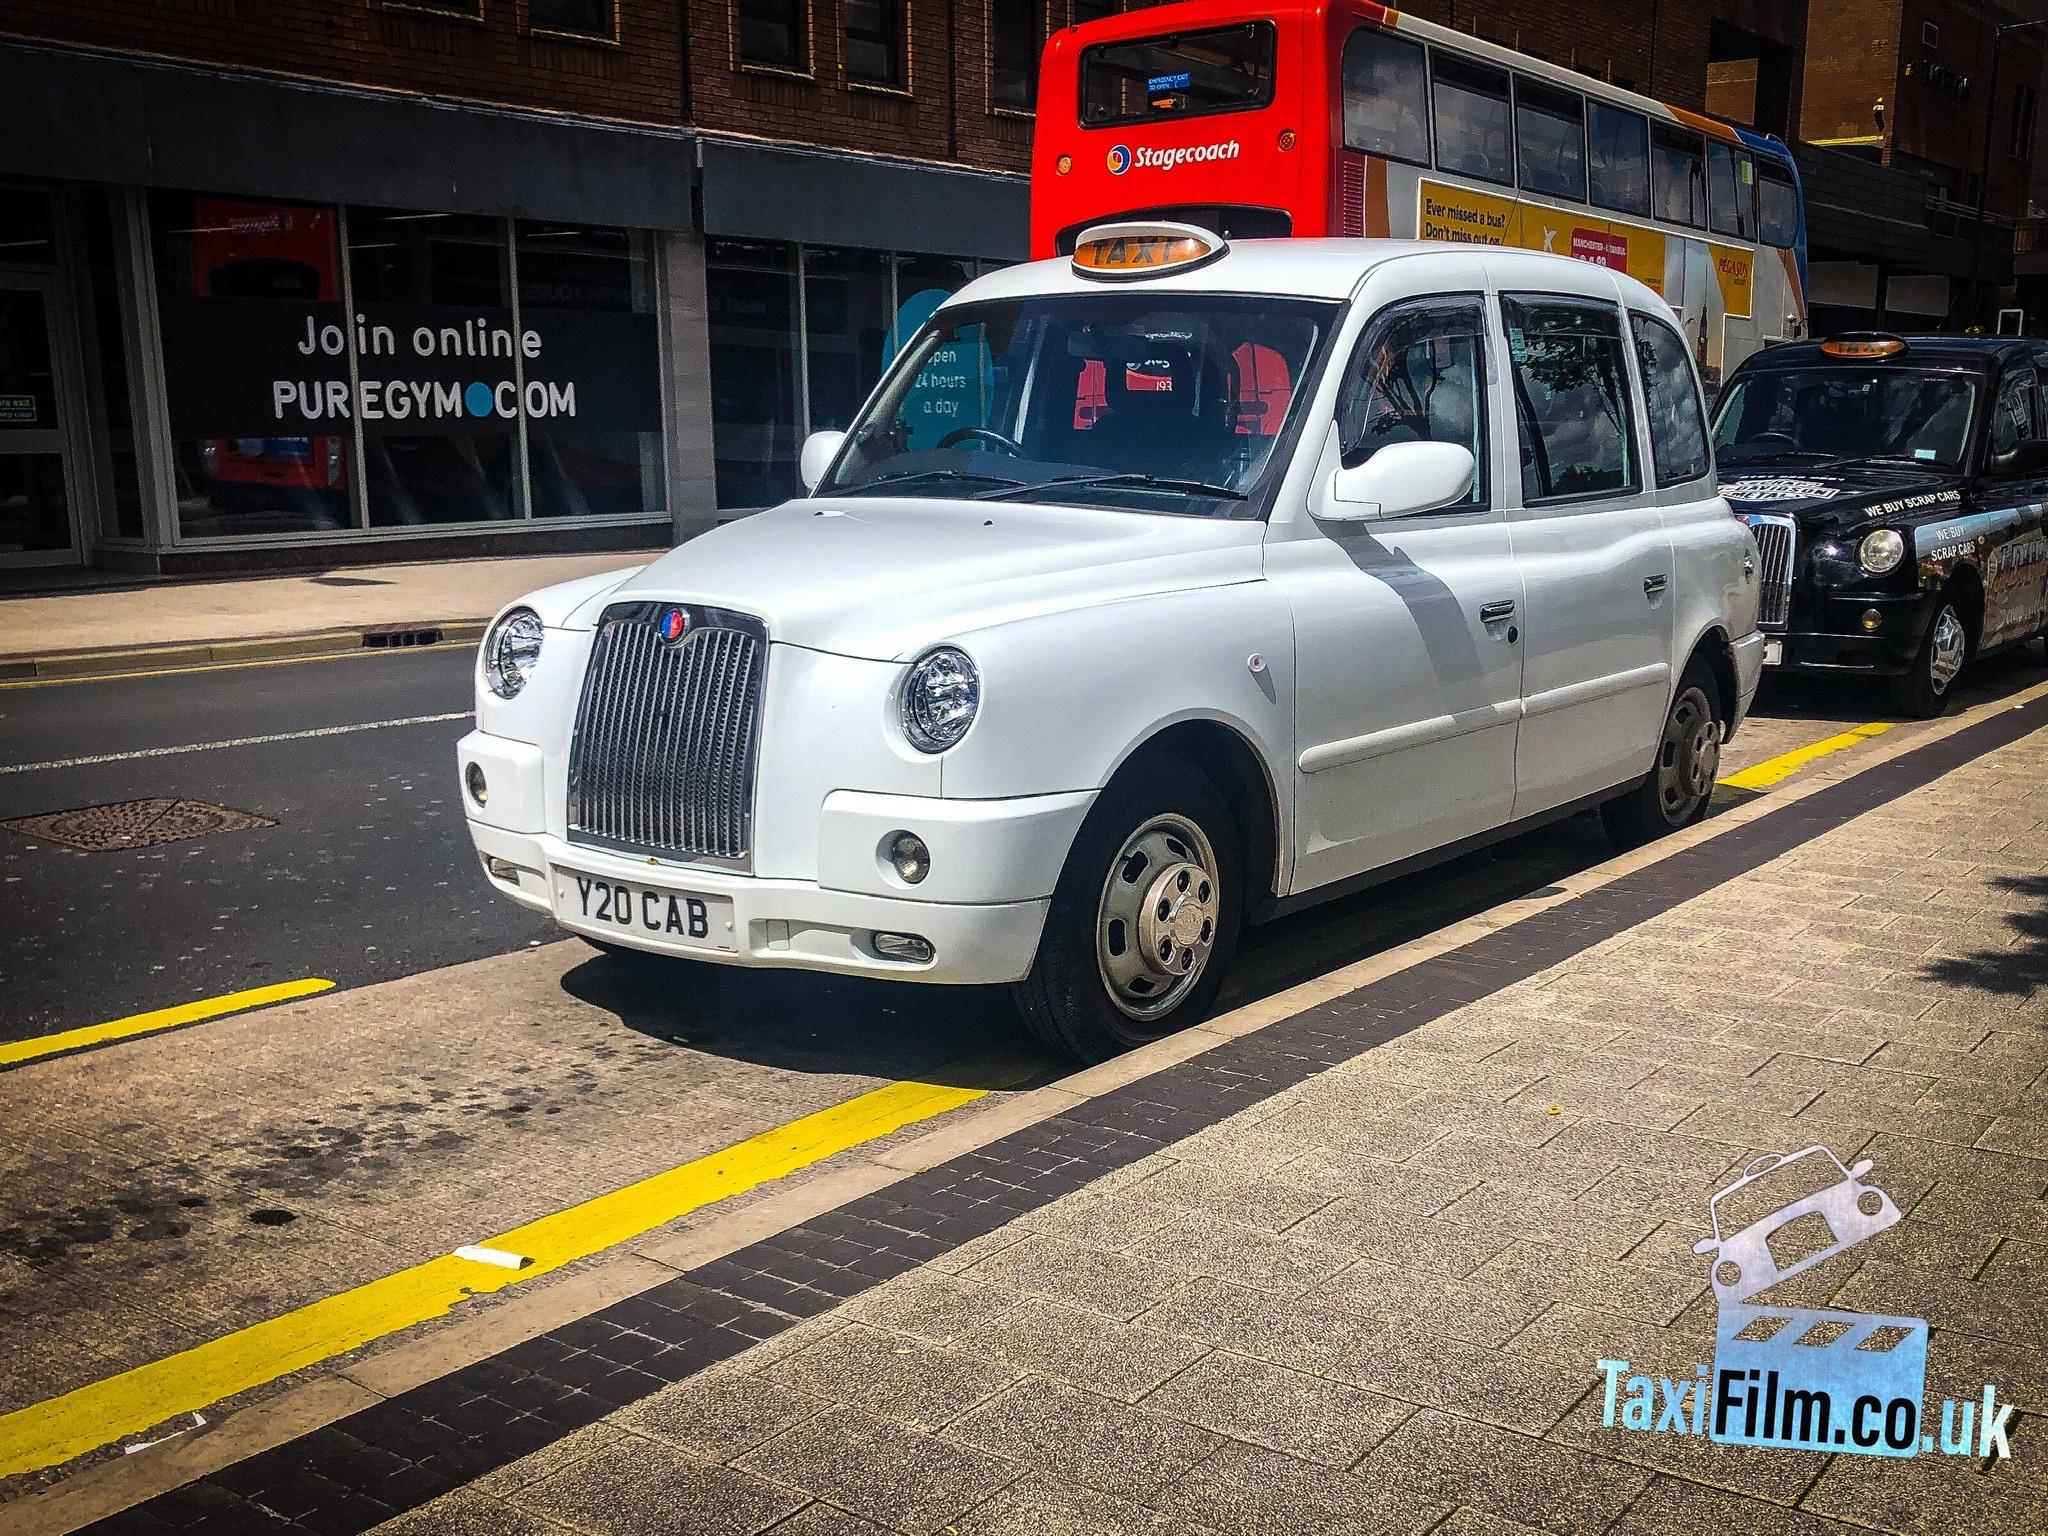 White Tx4 Taxi, ref 0007 prop car